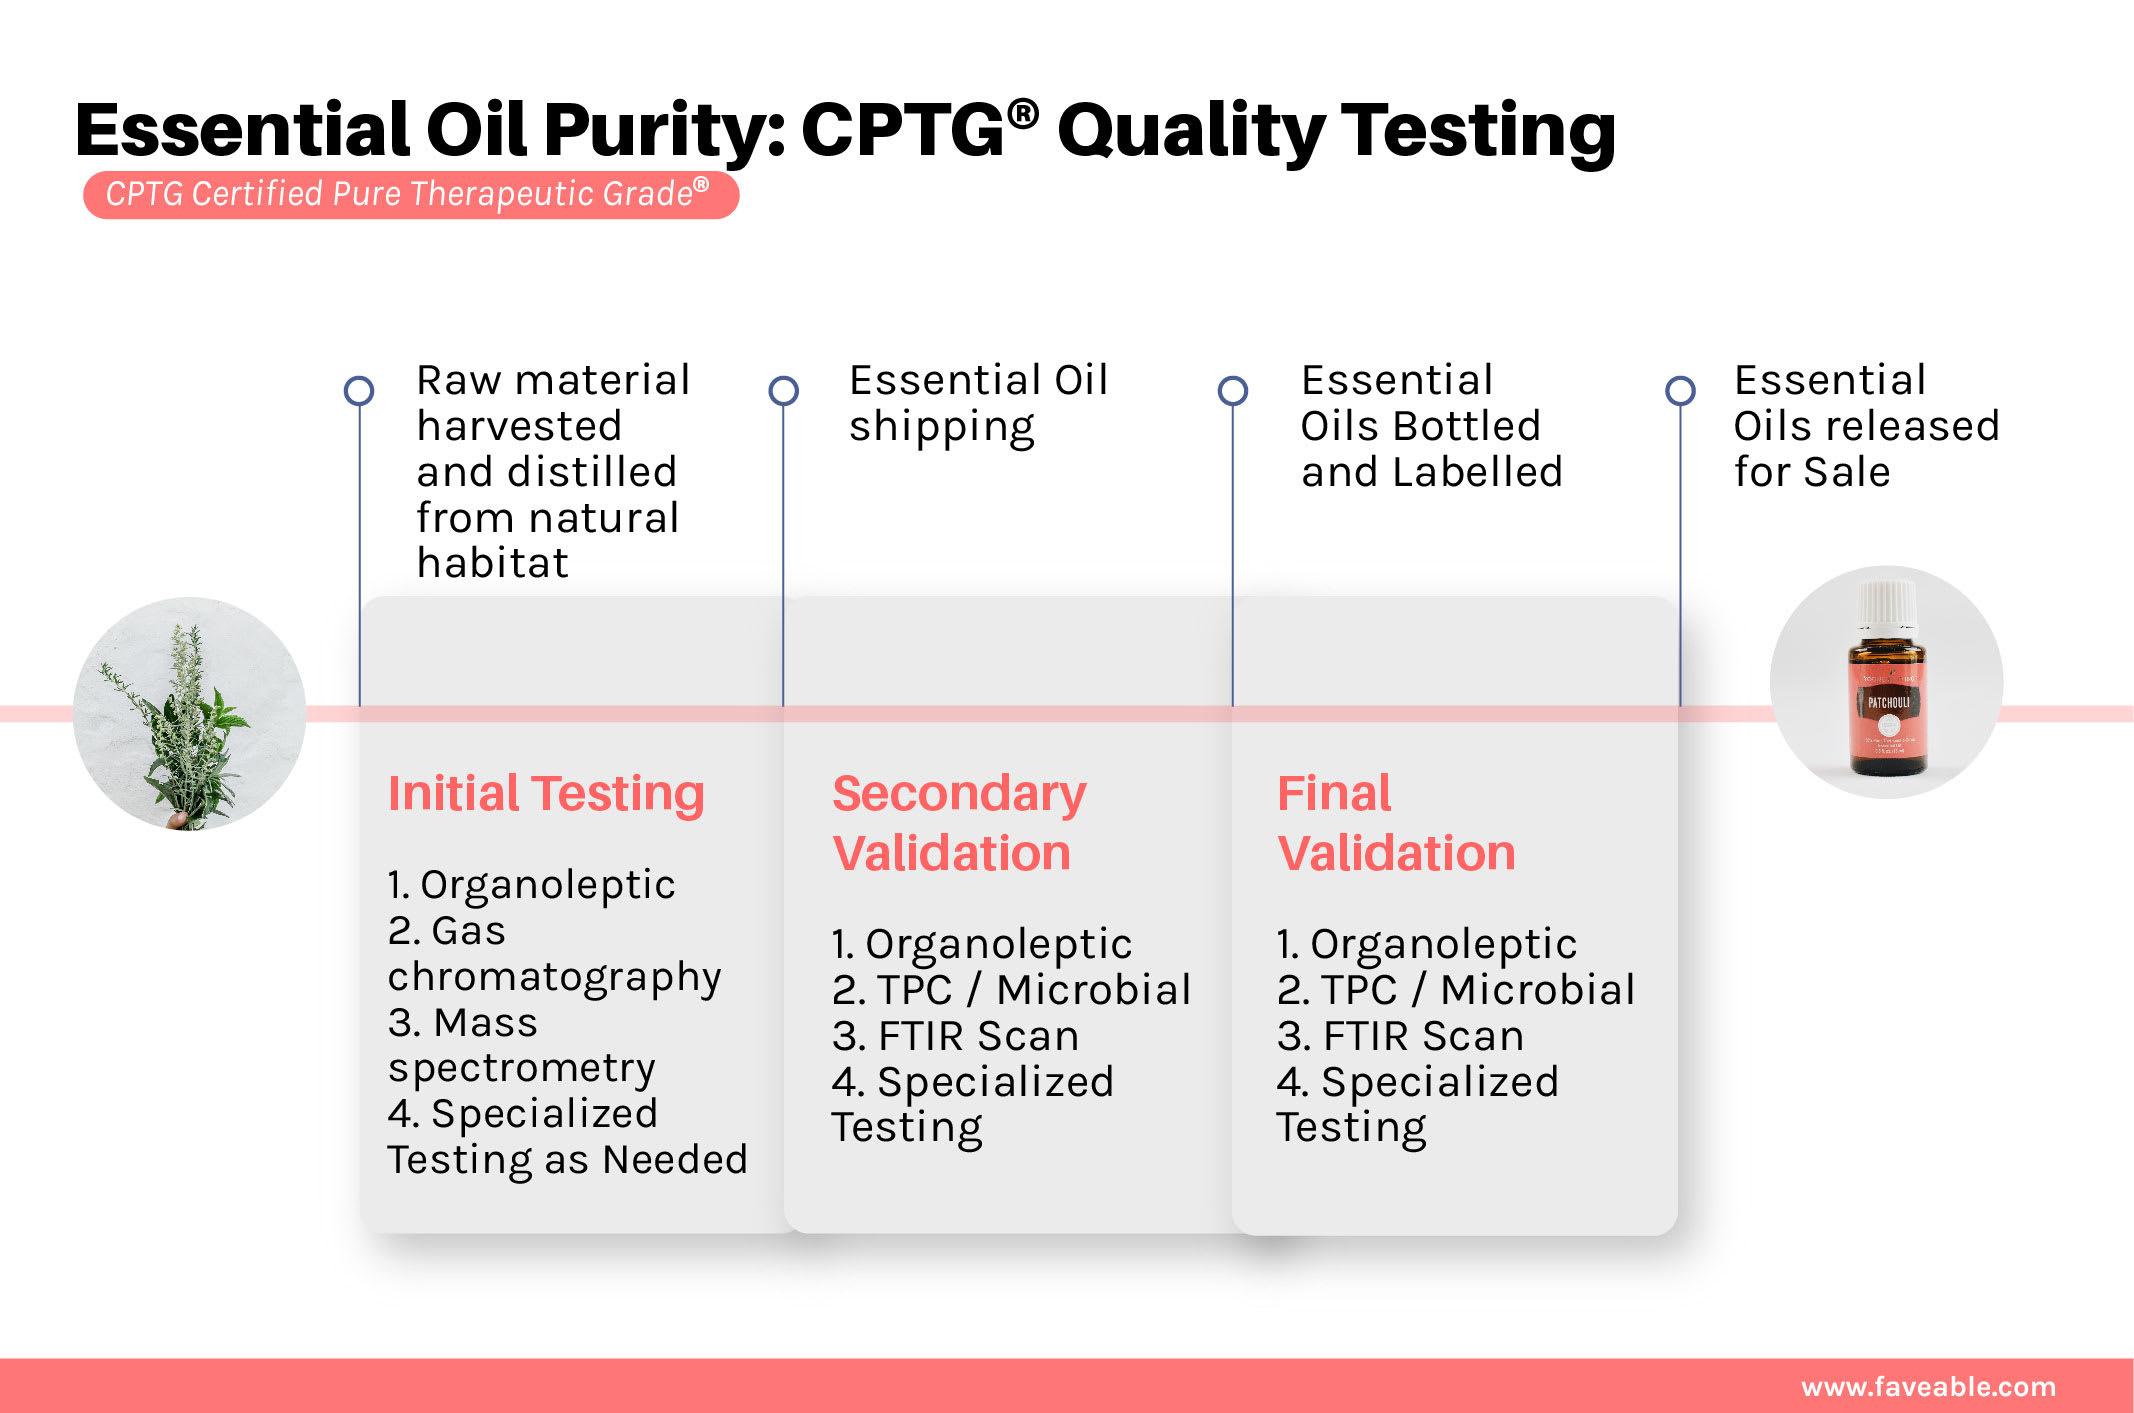 essential oil CPTG quality testing